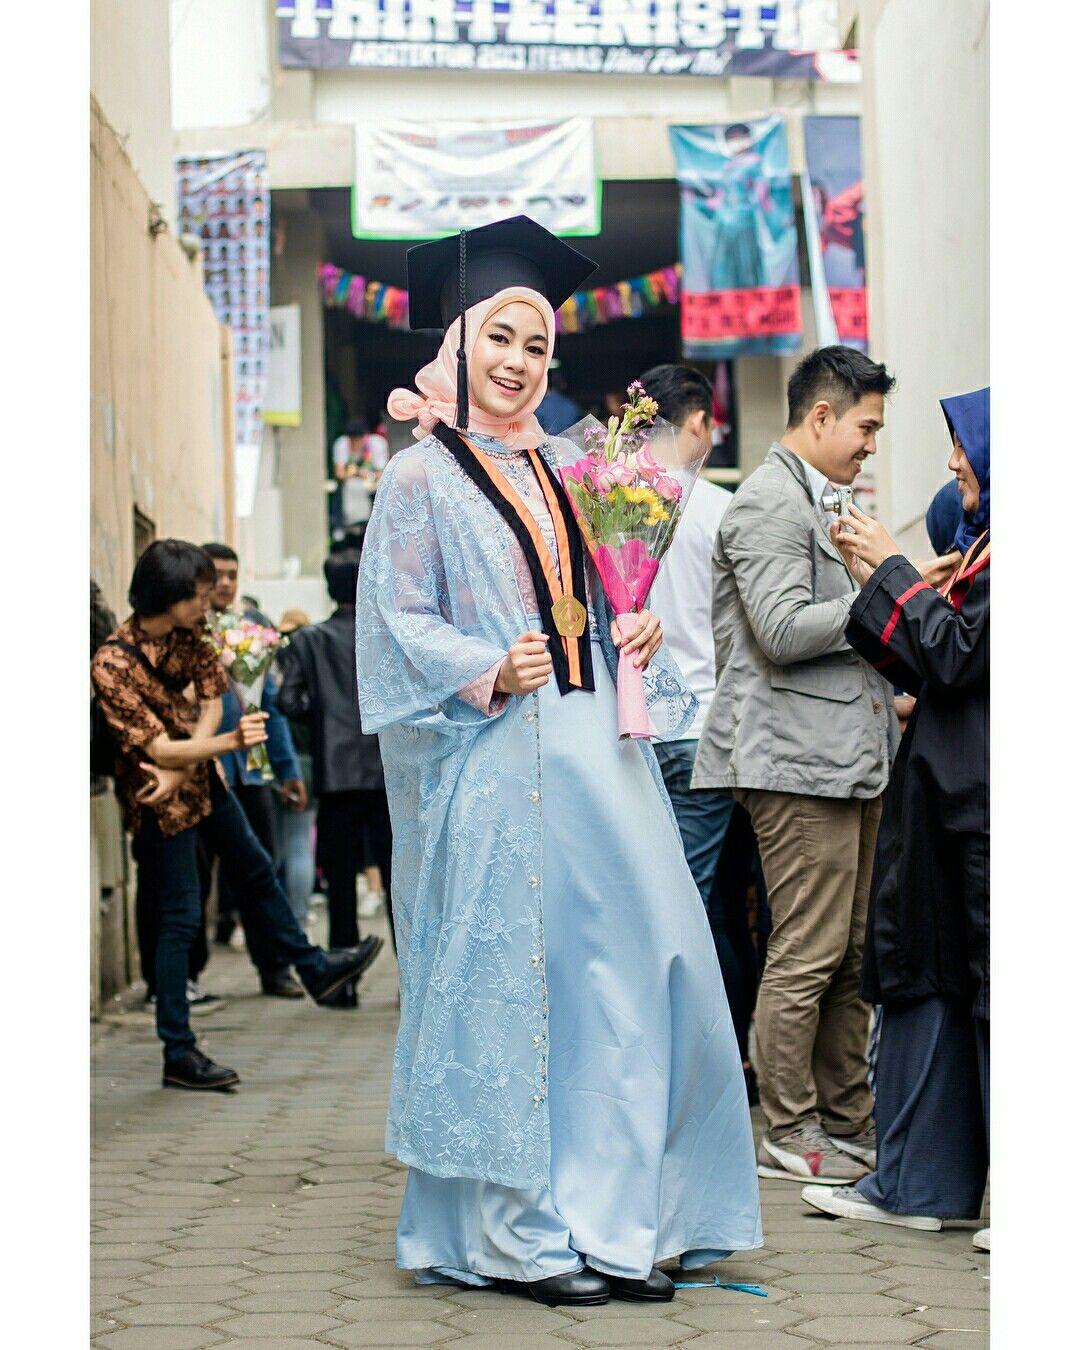 Anisarahma 12 Gaun Wisuda Pakaian Wanita Pengantin Wanita